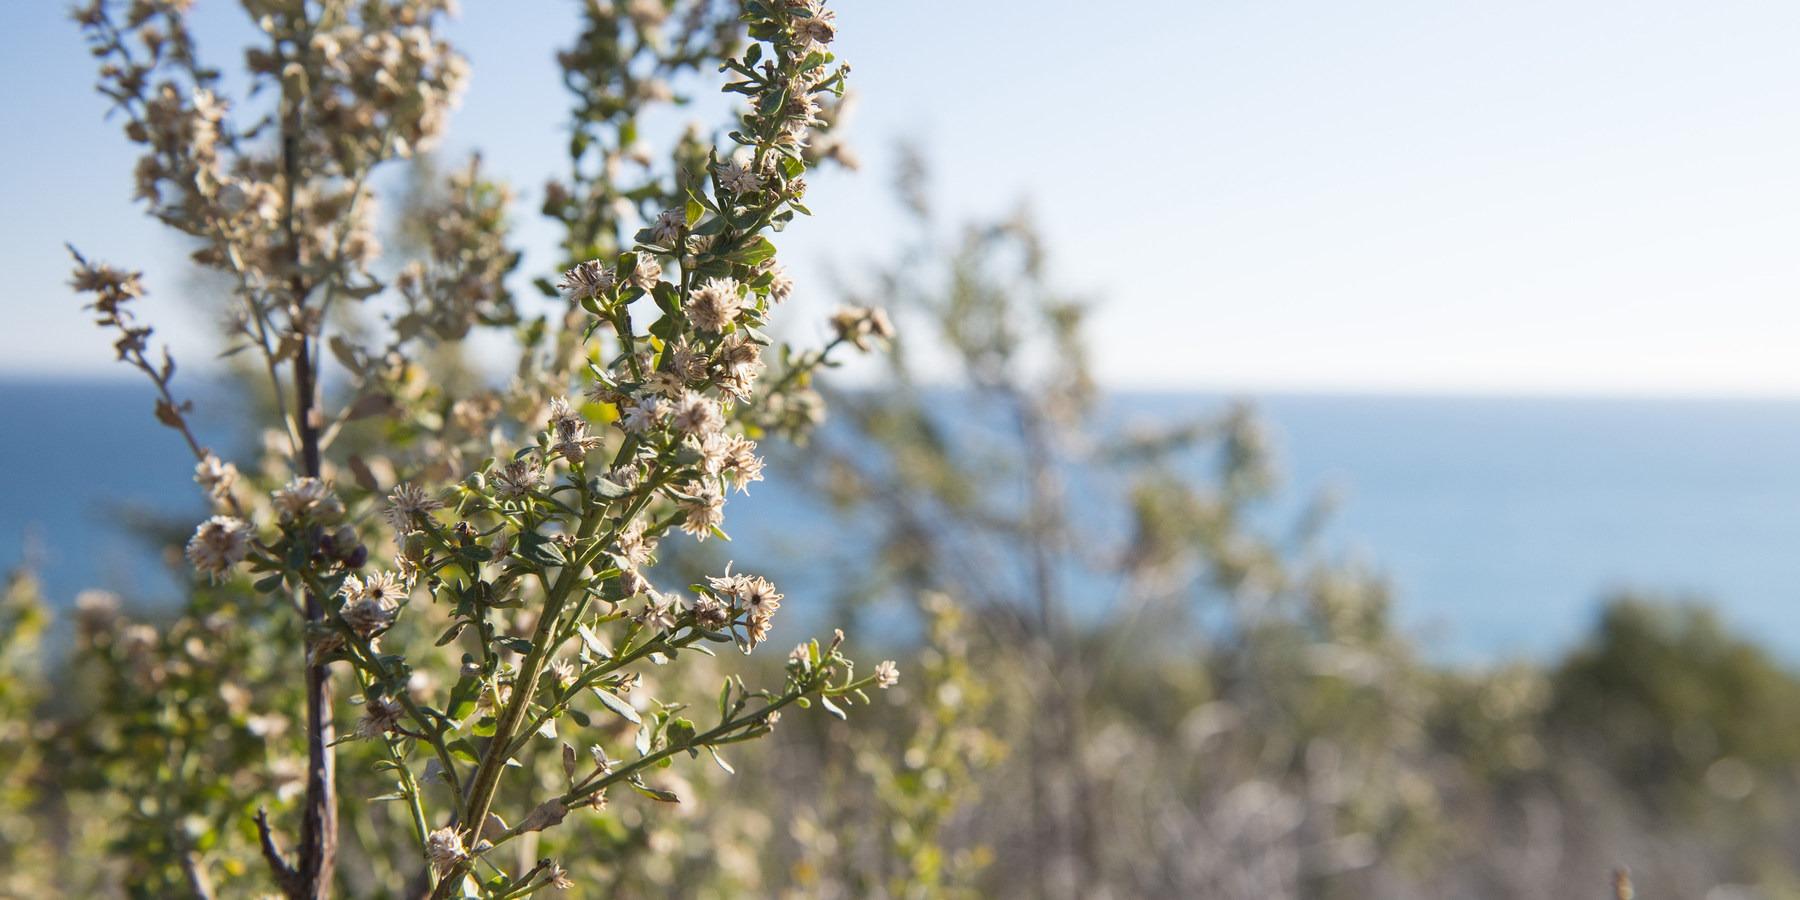 Malibu Bluffs Park Outdoor Project